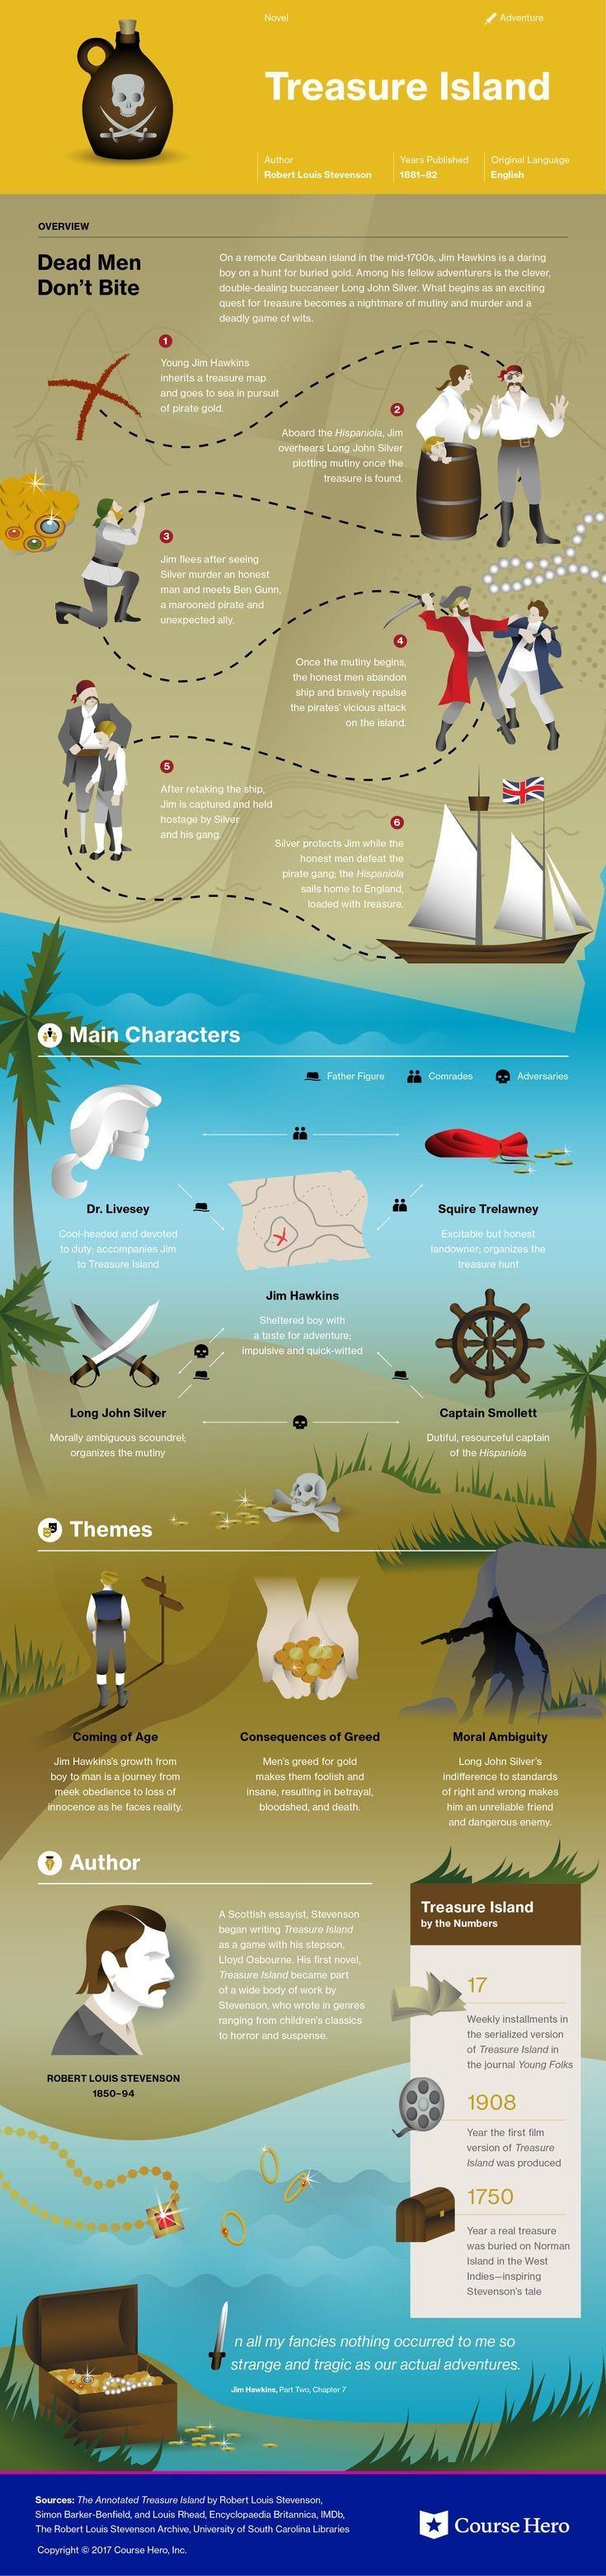 This @courseherographic On Treasure Island Is Both Visually Stunning  Andrmative!